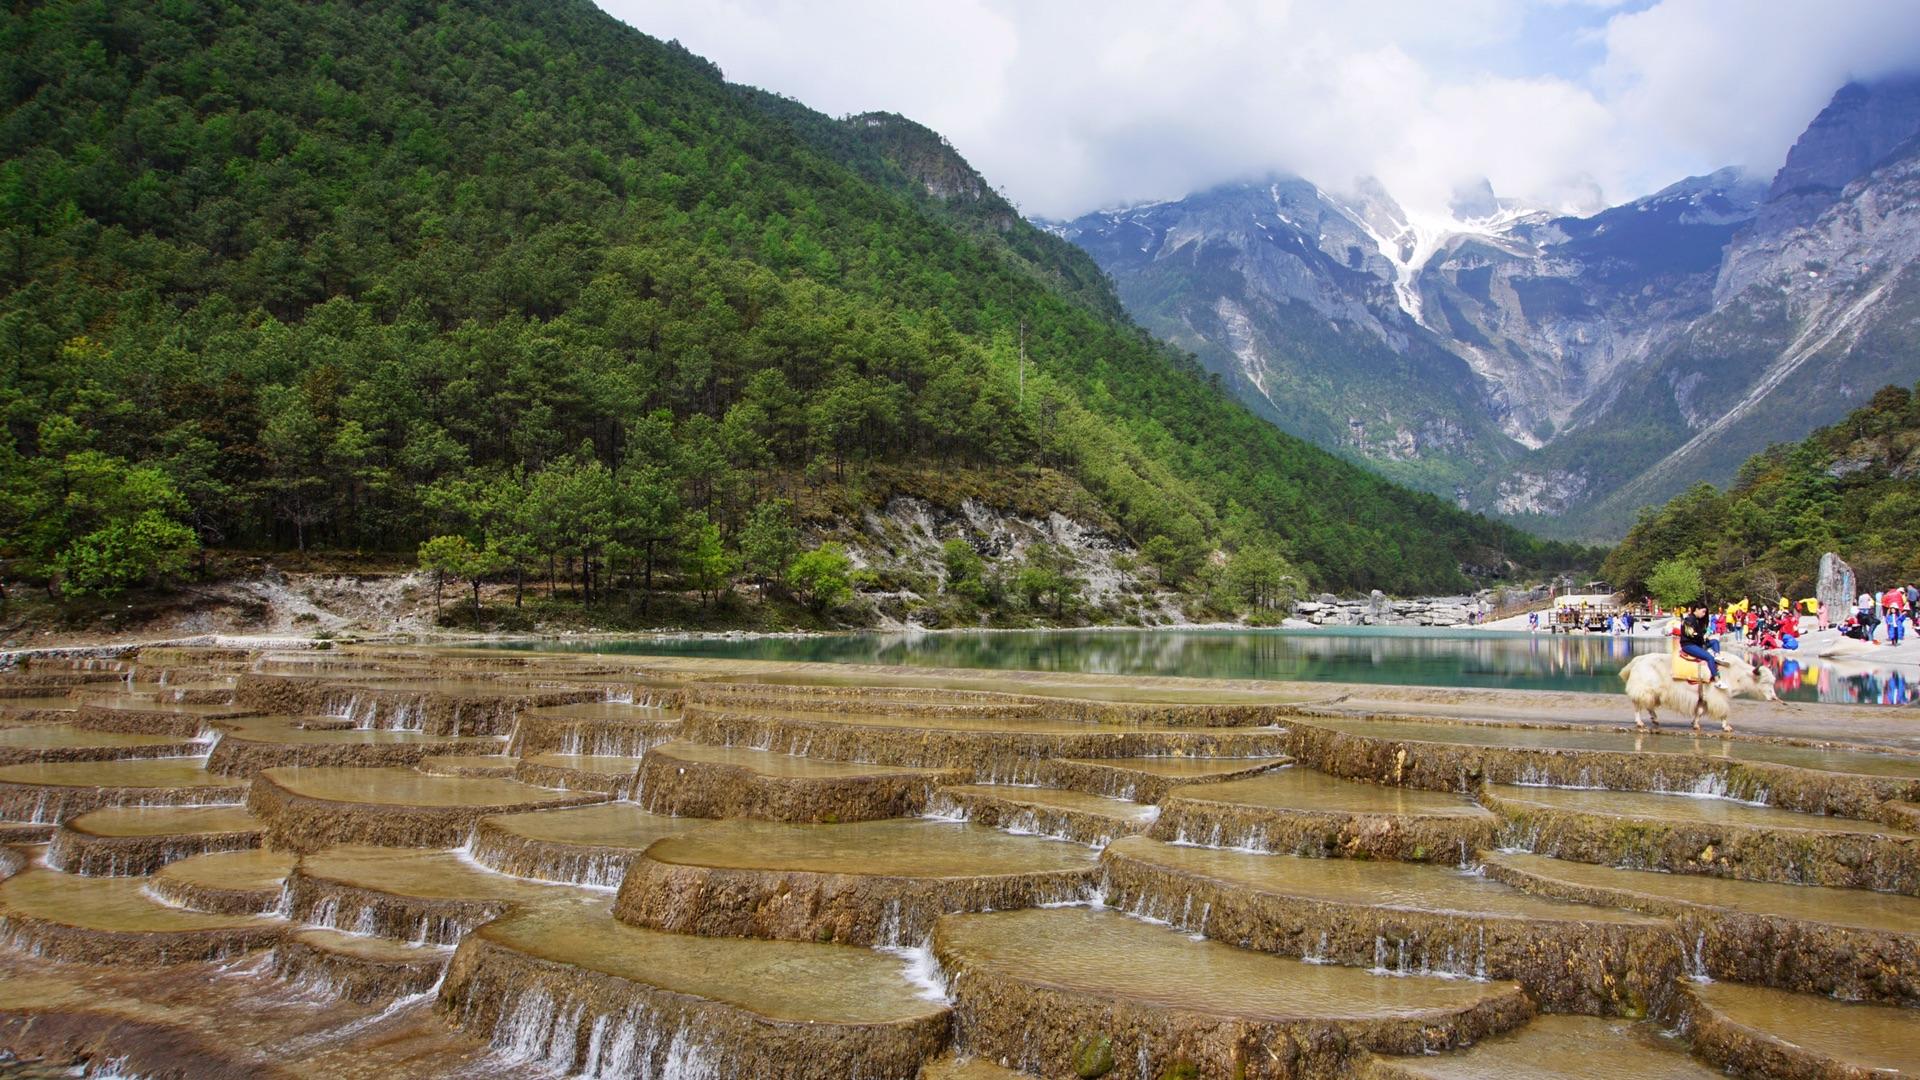 LiJiang Blue Moon Valley